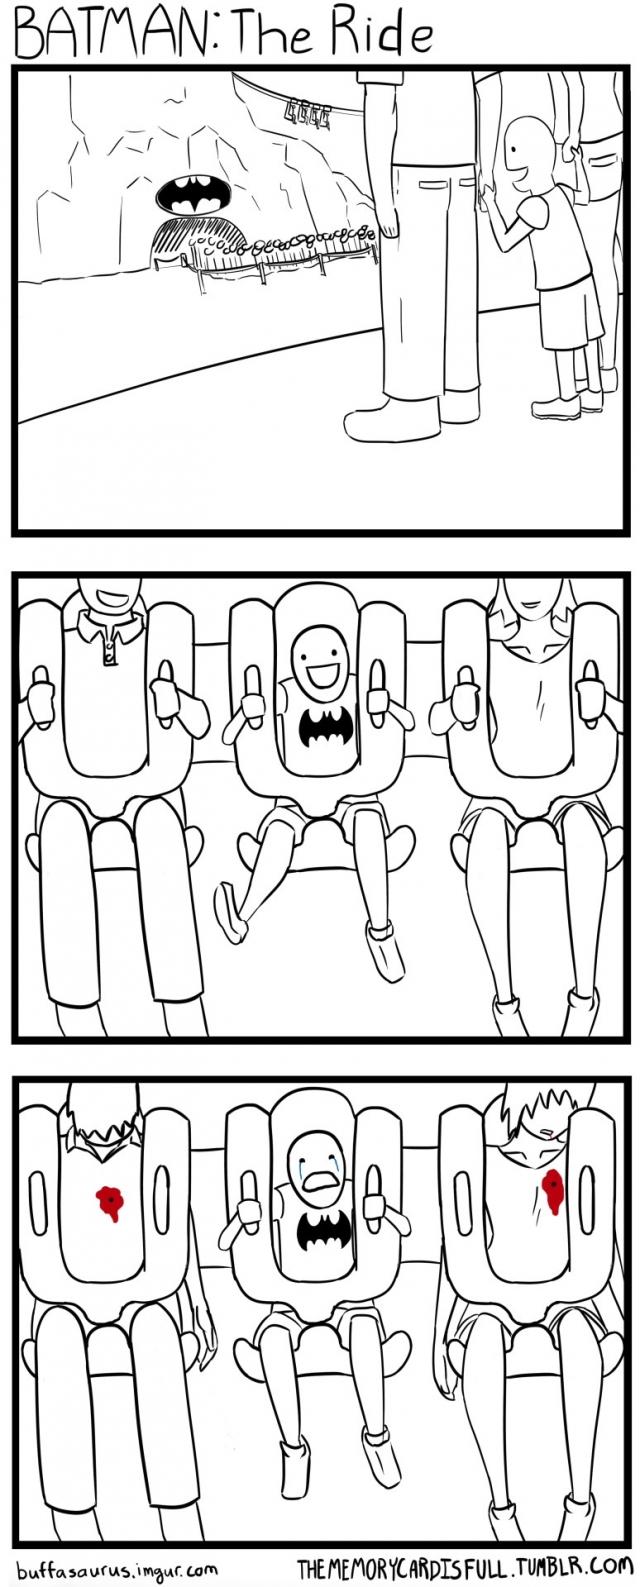 Batman - The Ride.jpg